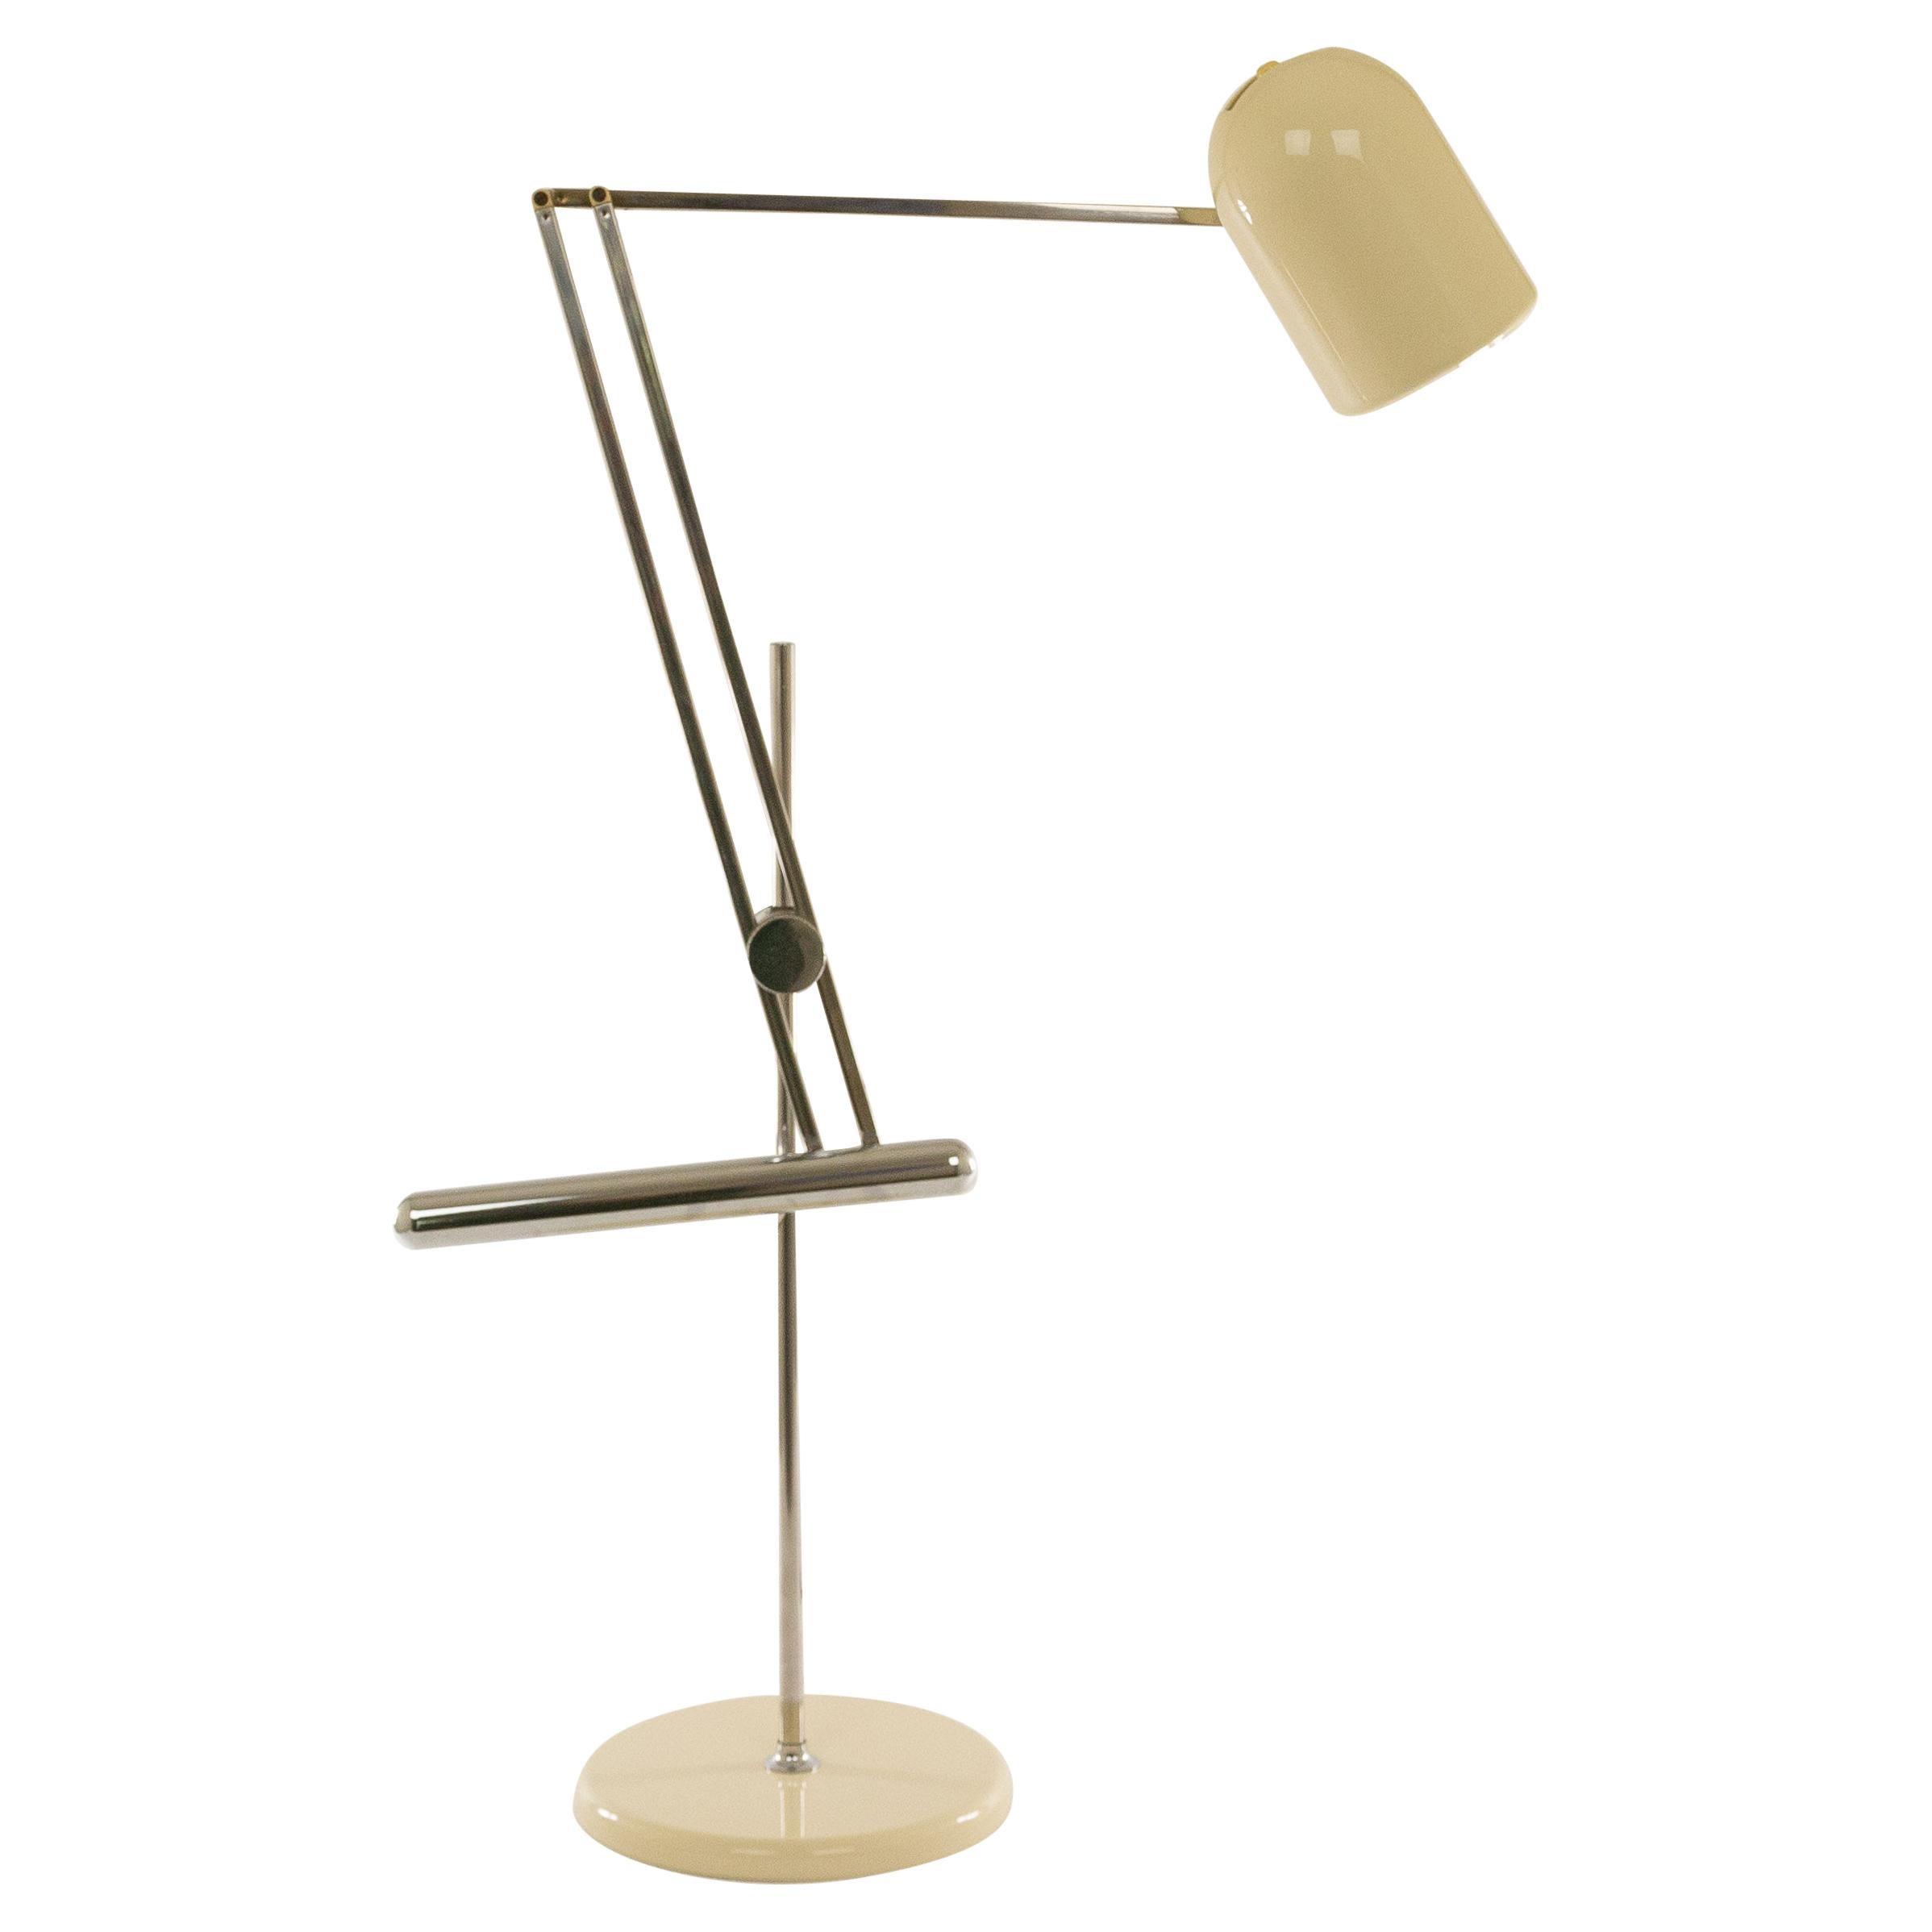 Adjustable Table Lamp G32 by Reggiani Illuminazione, 1970s